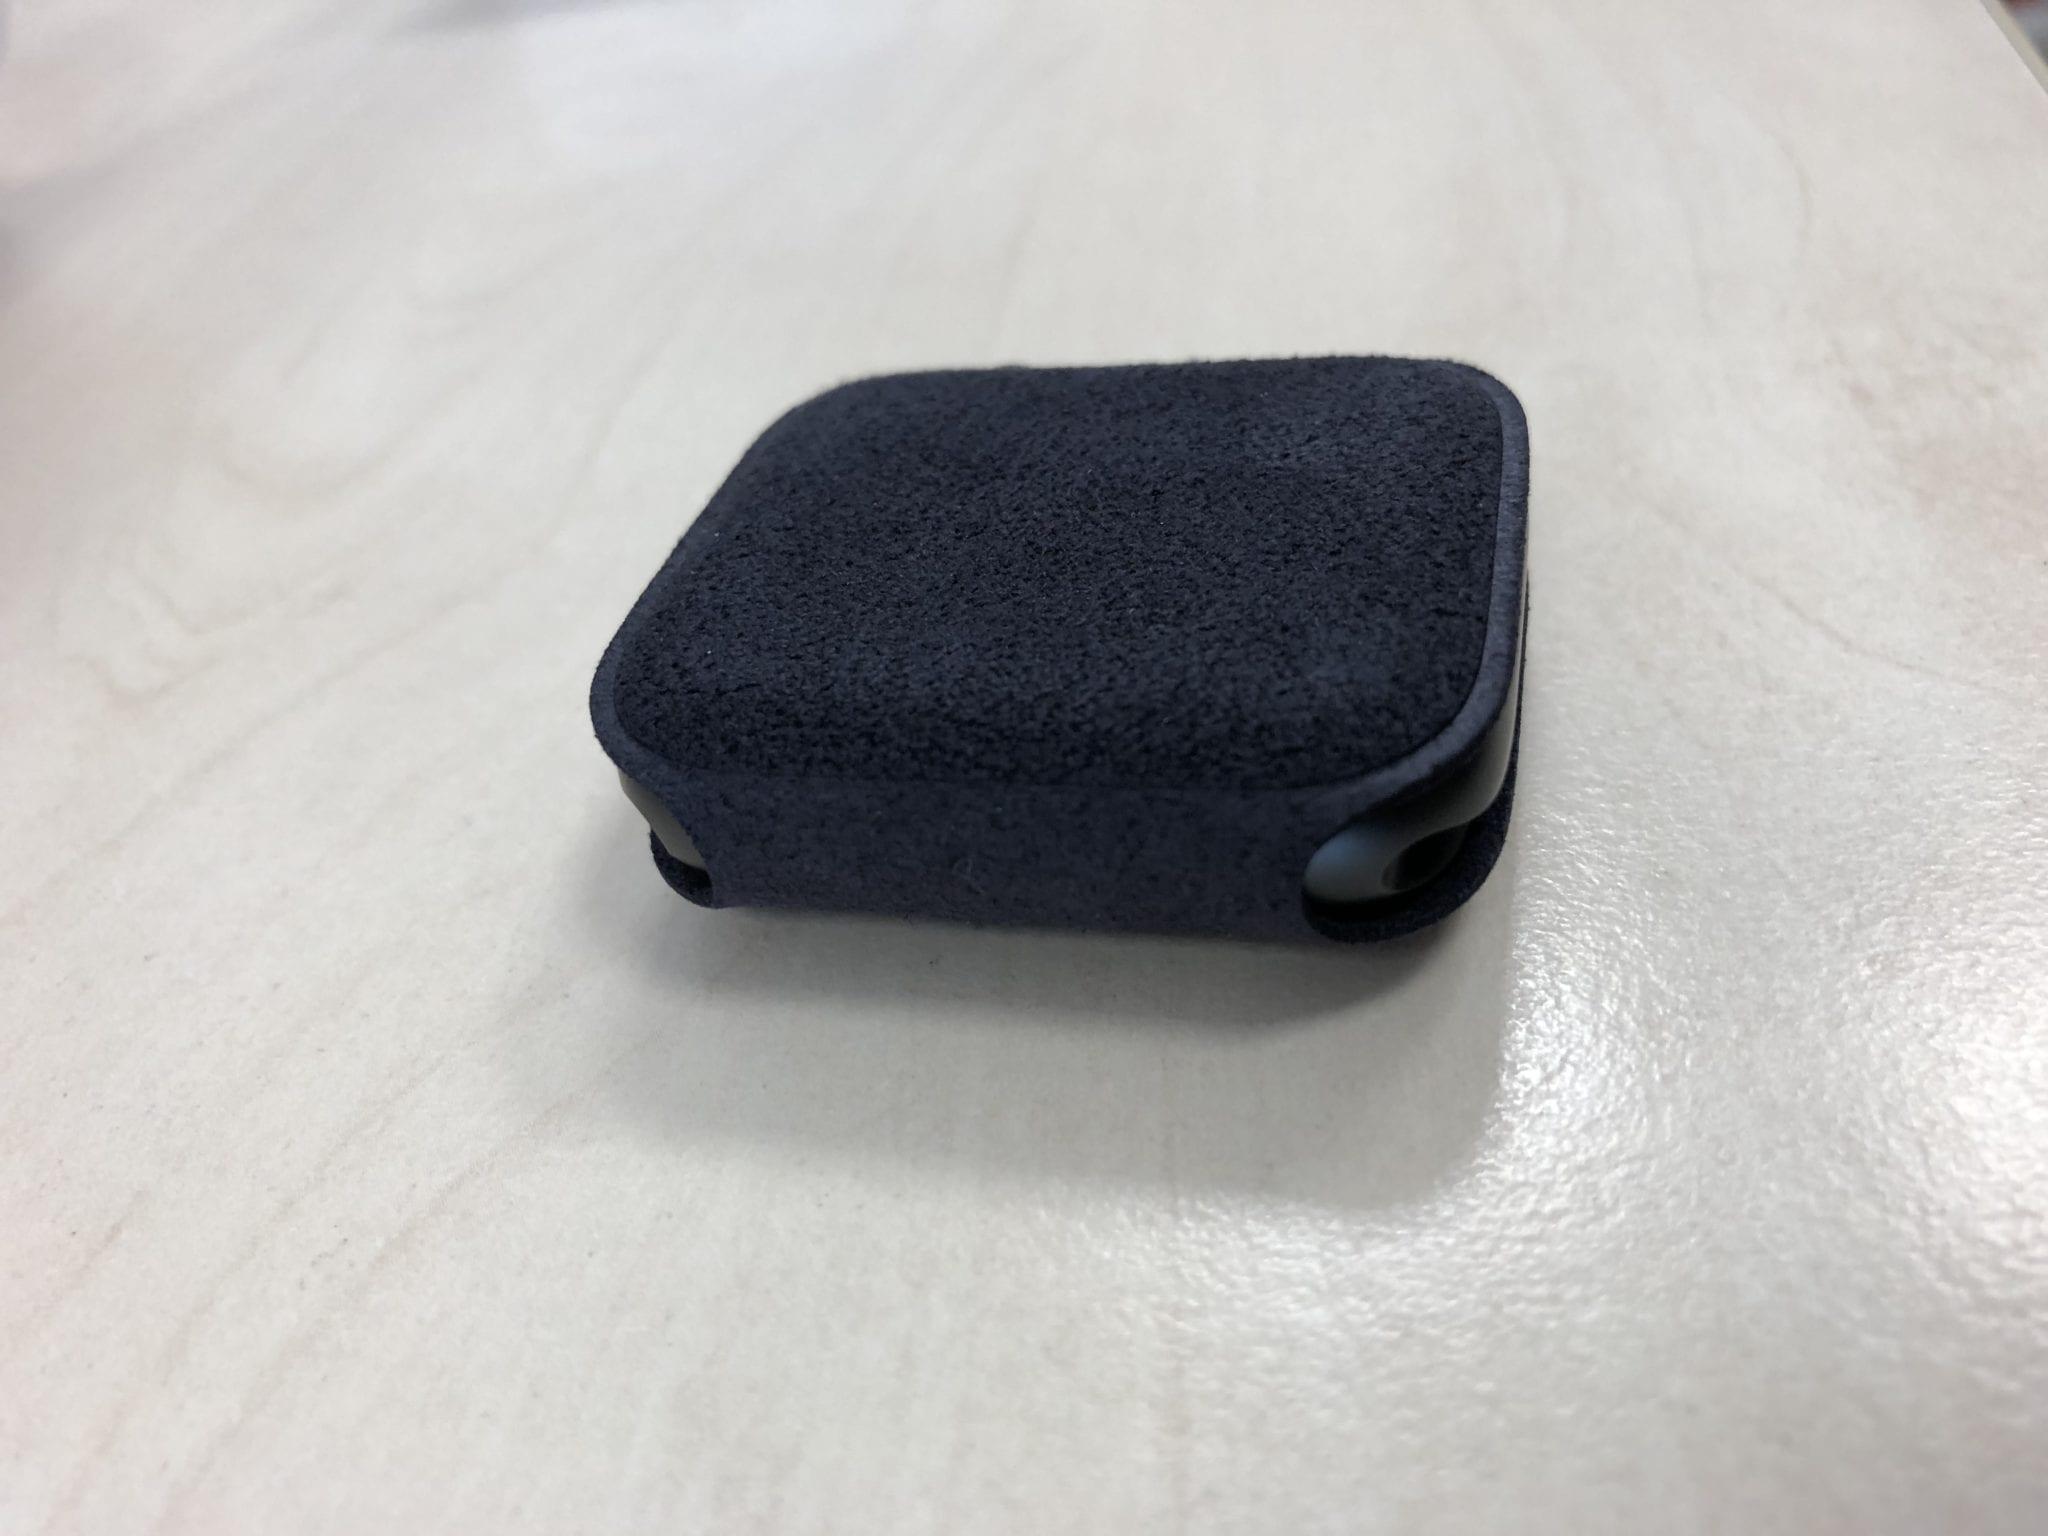 IMG 8698 - Prvé dojmy: Apple Watch Series 4